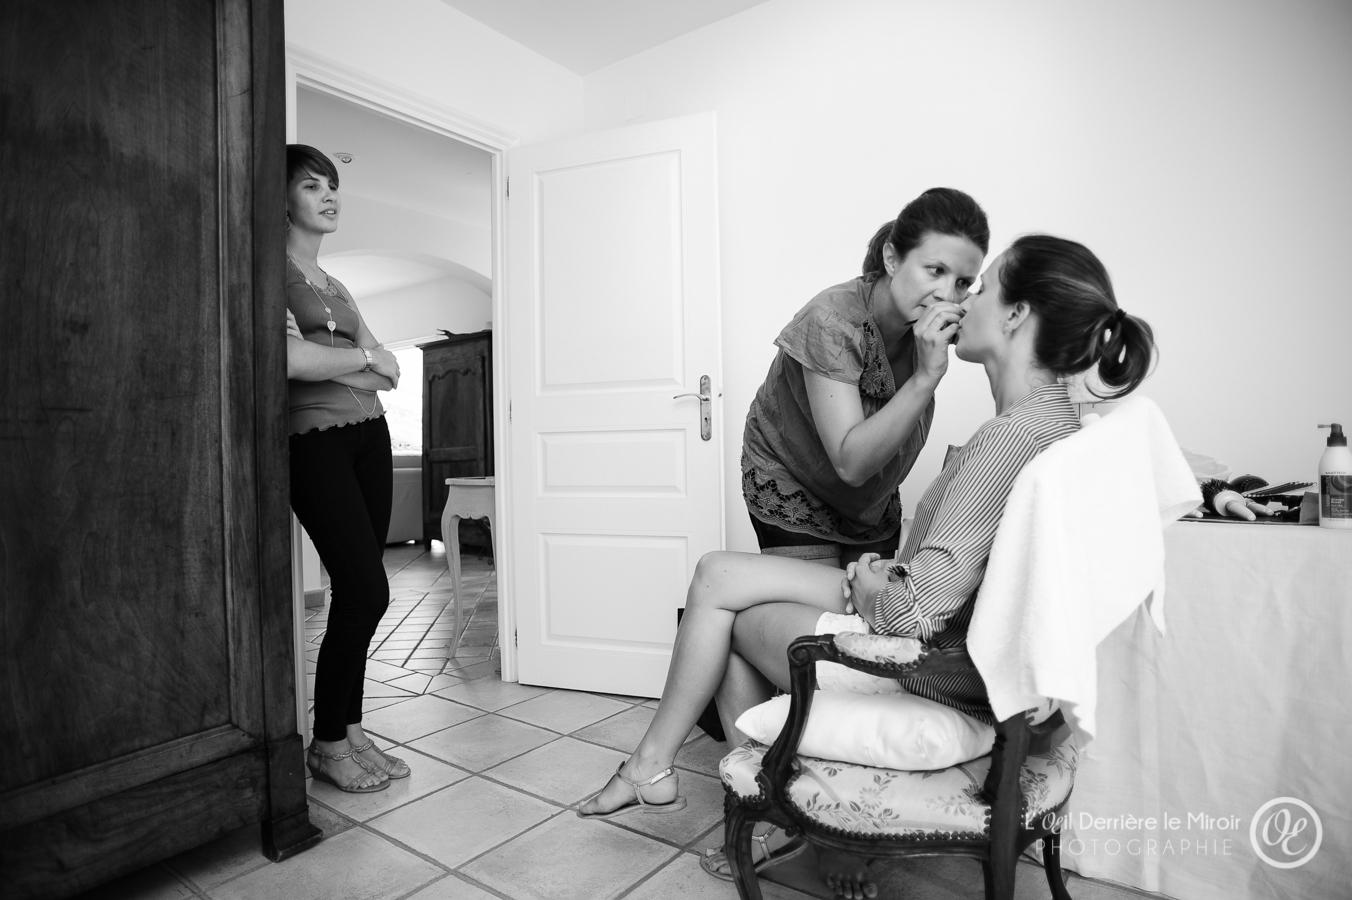 Photographe-Mariage-grasse-loeilderrierelemiroir-jt-003